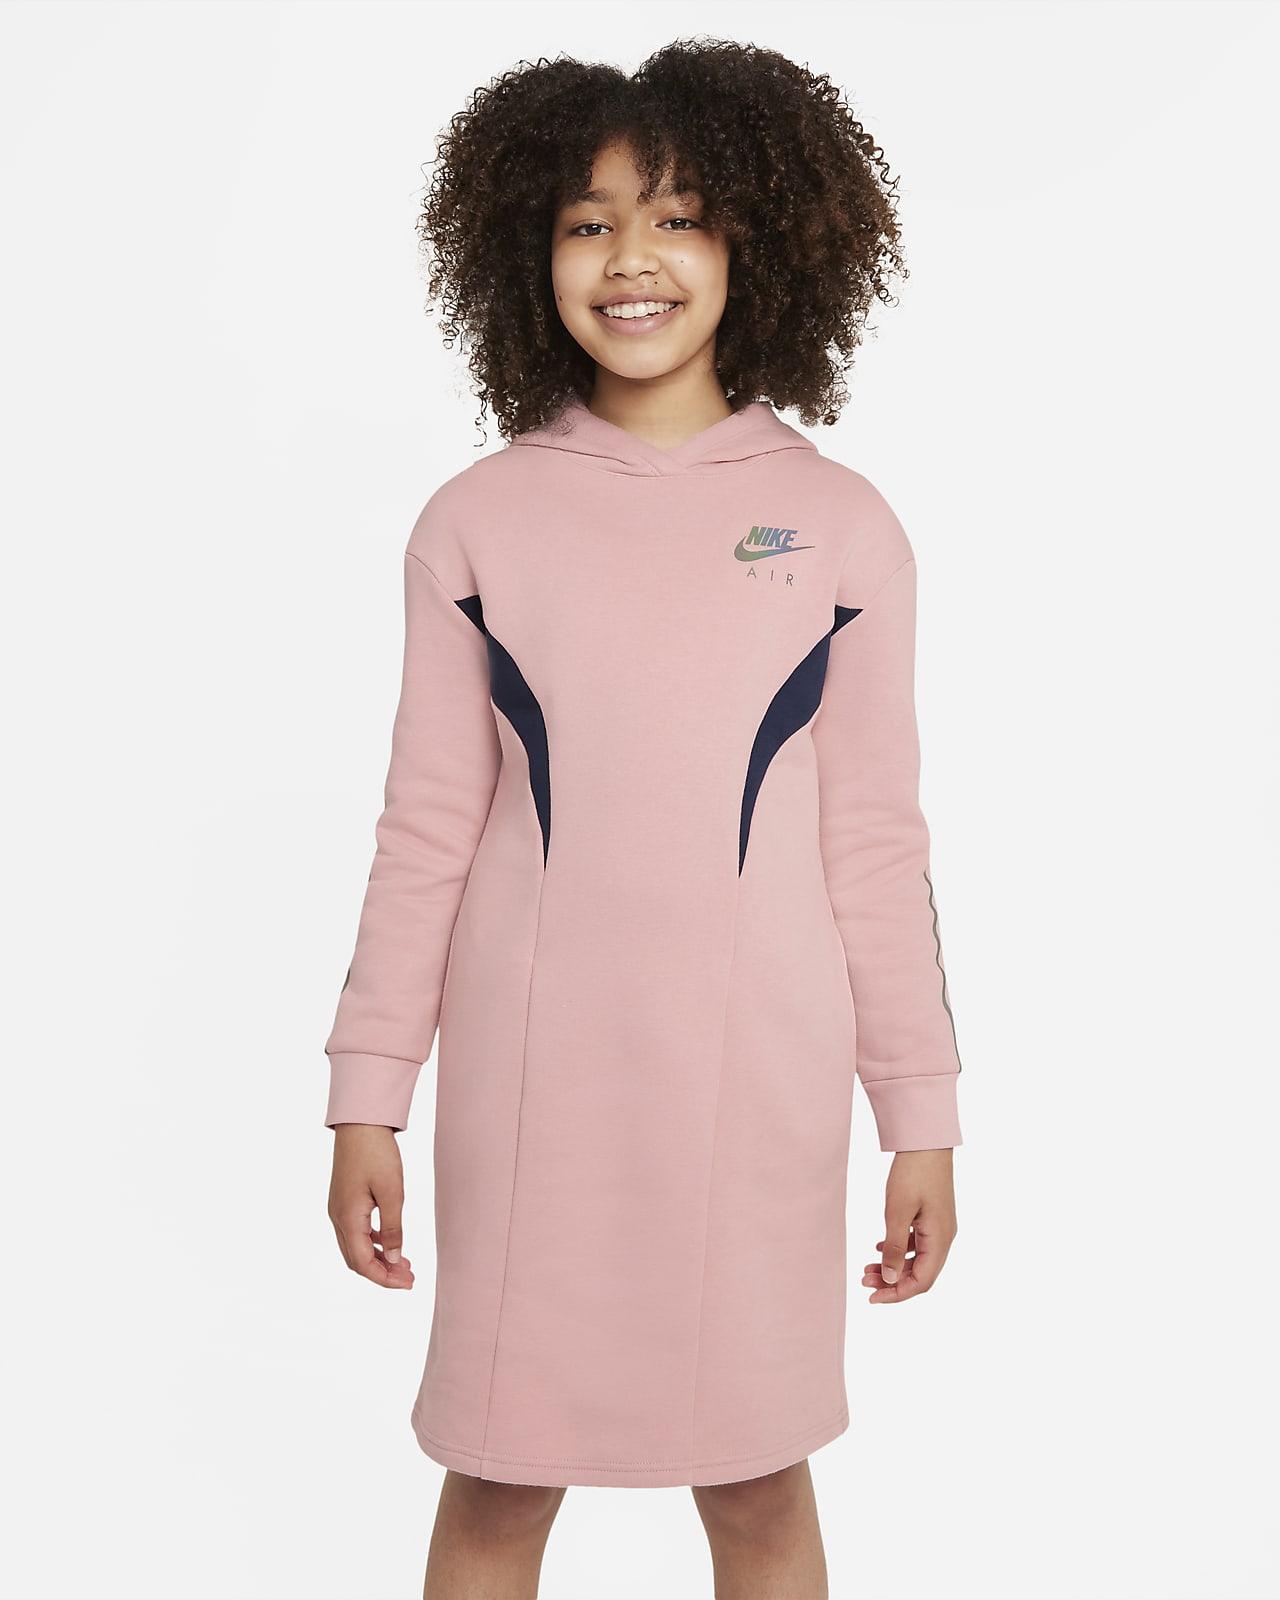 Nike Air Older Kids' (Girls') Fleece Dress